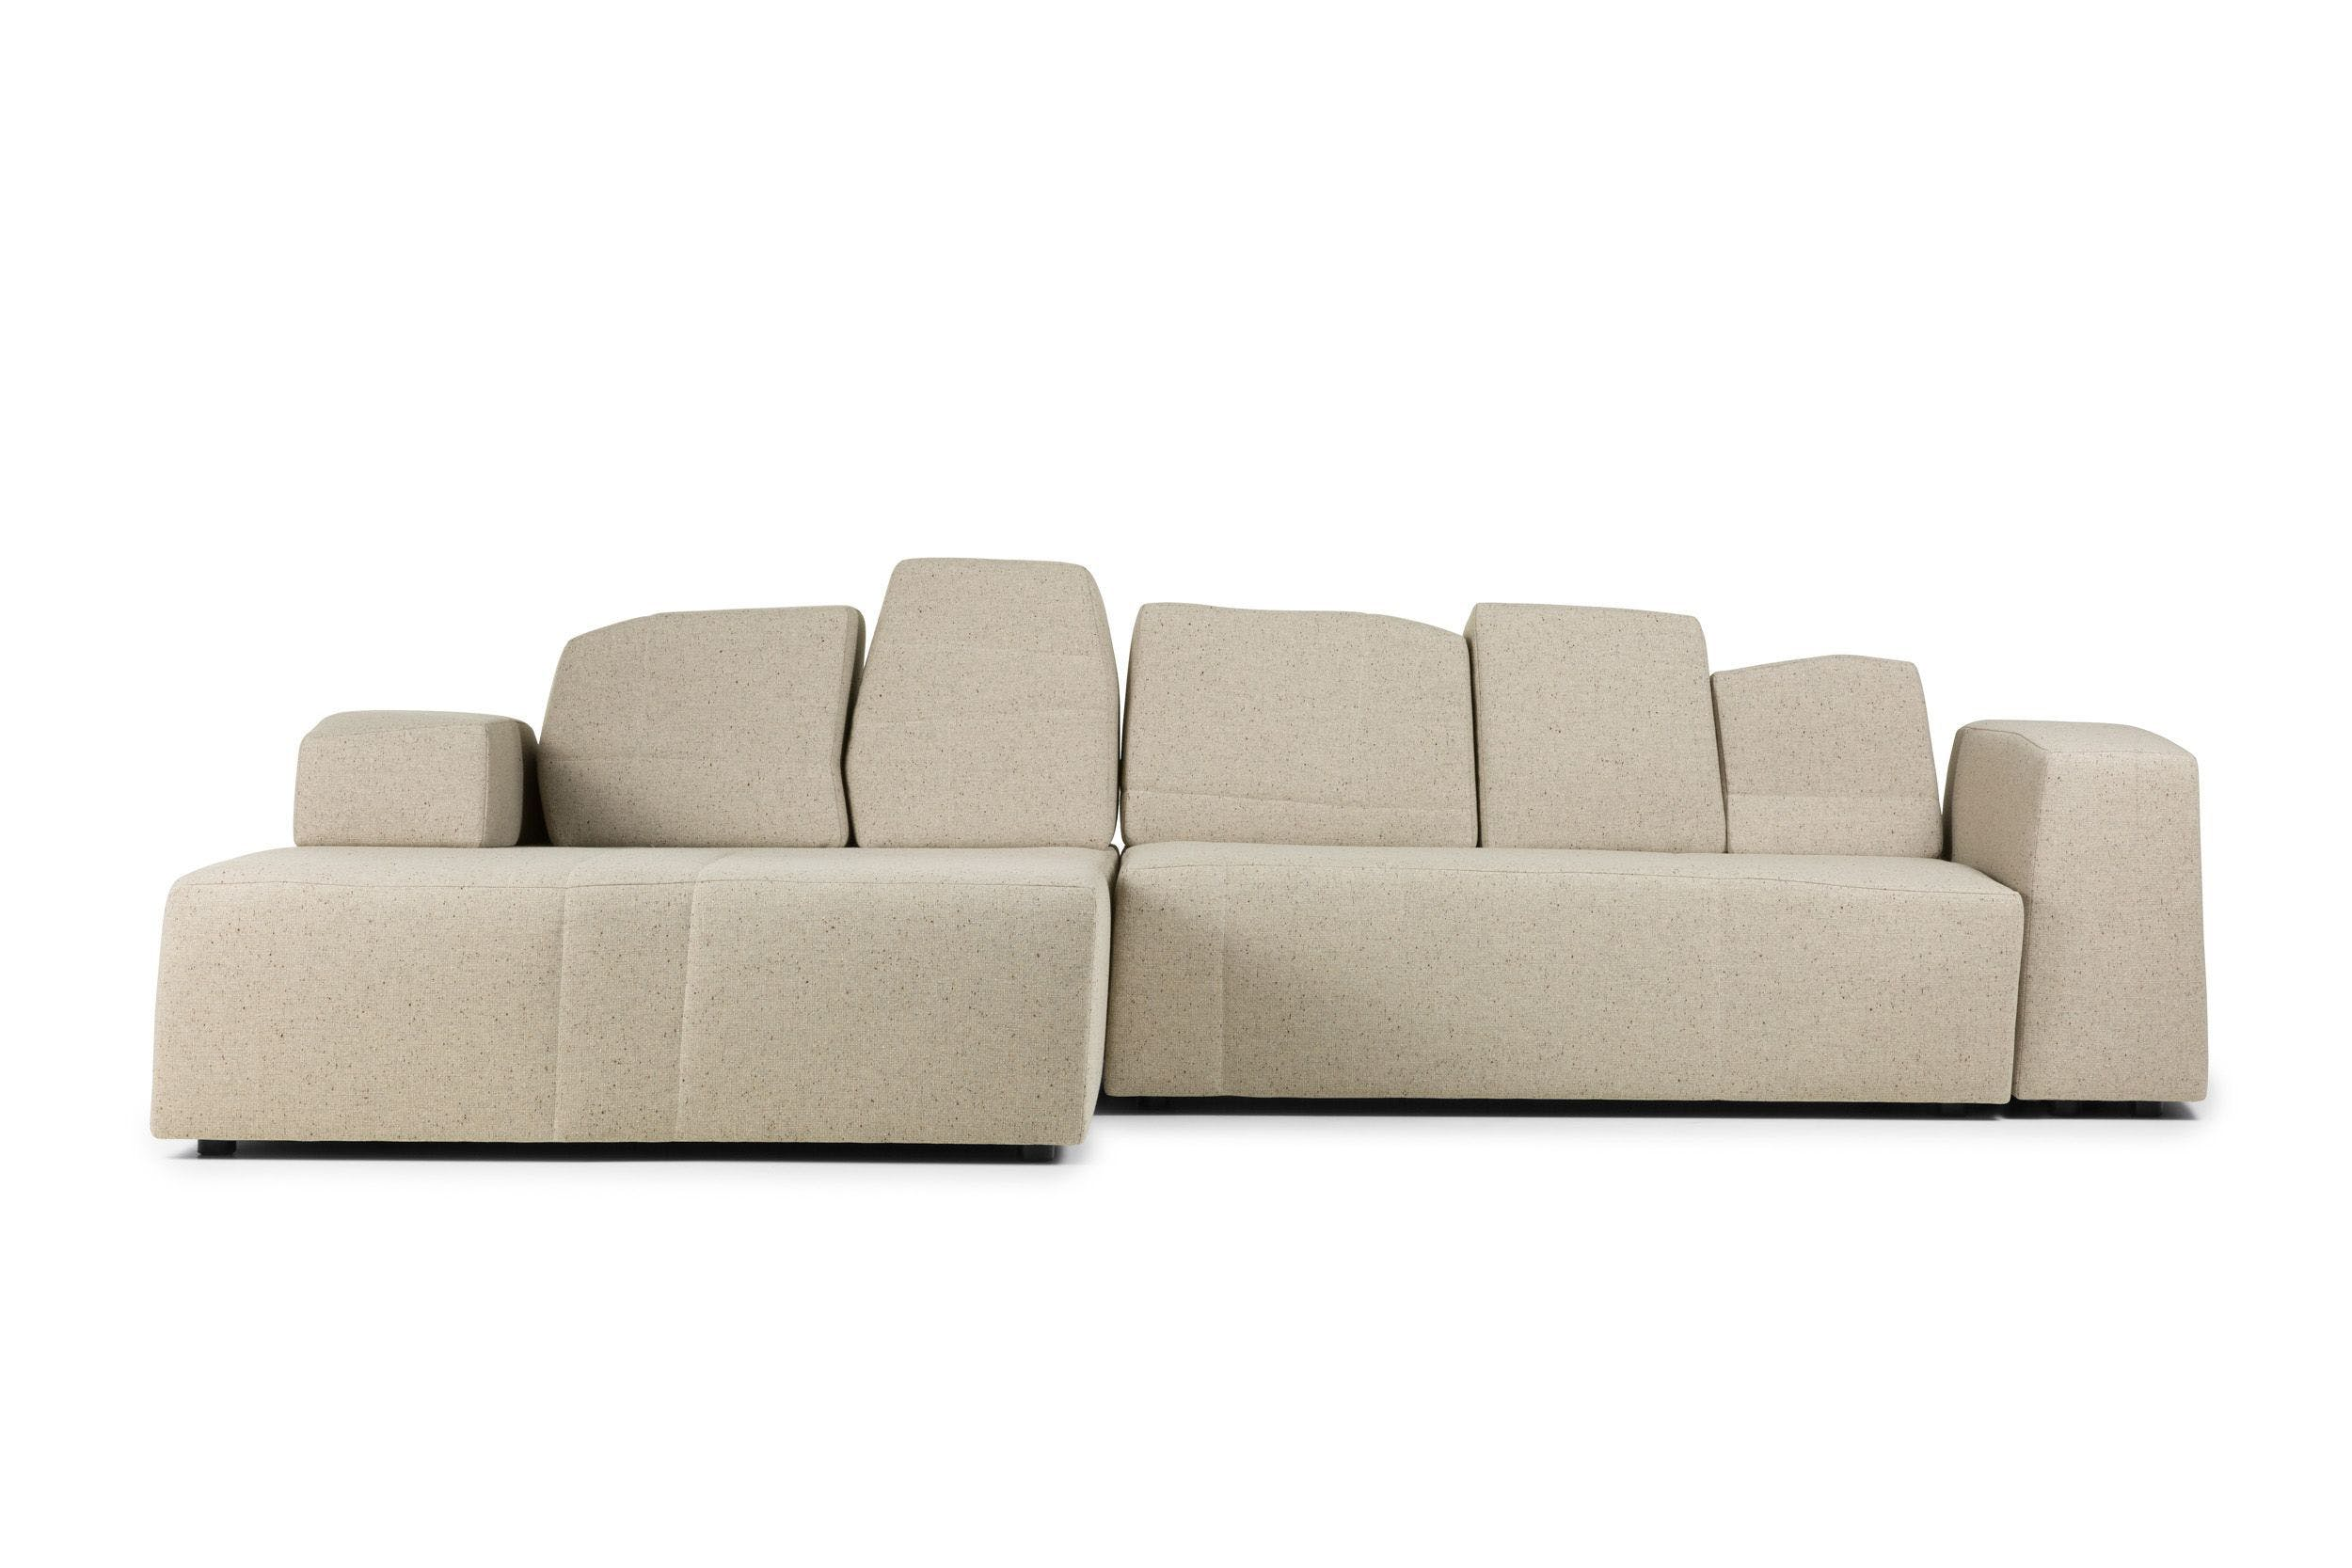 Something Like This Sofa Solis Paper Front 1 Moooi Web